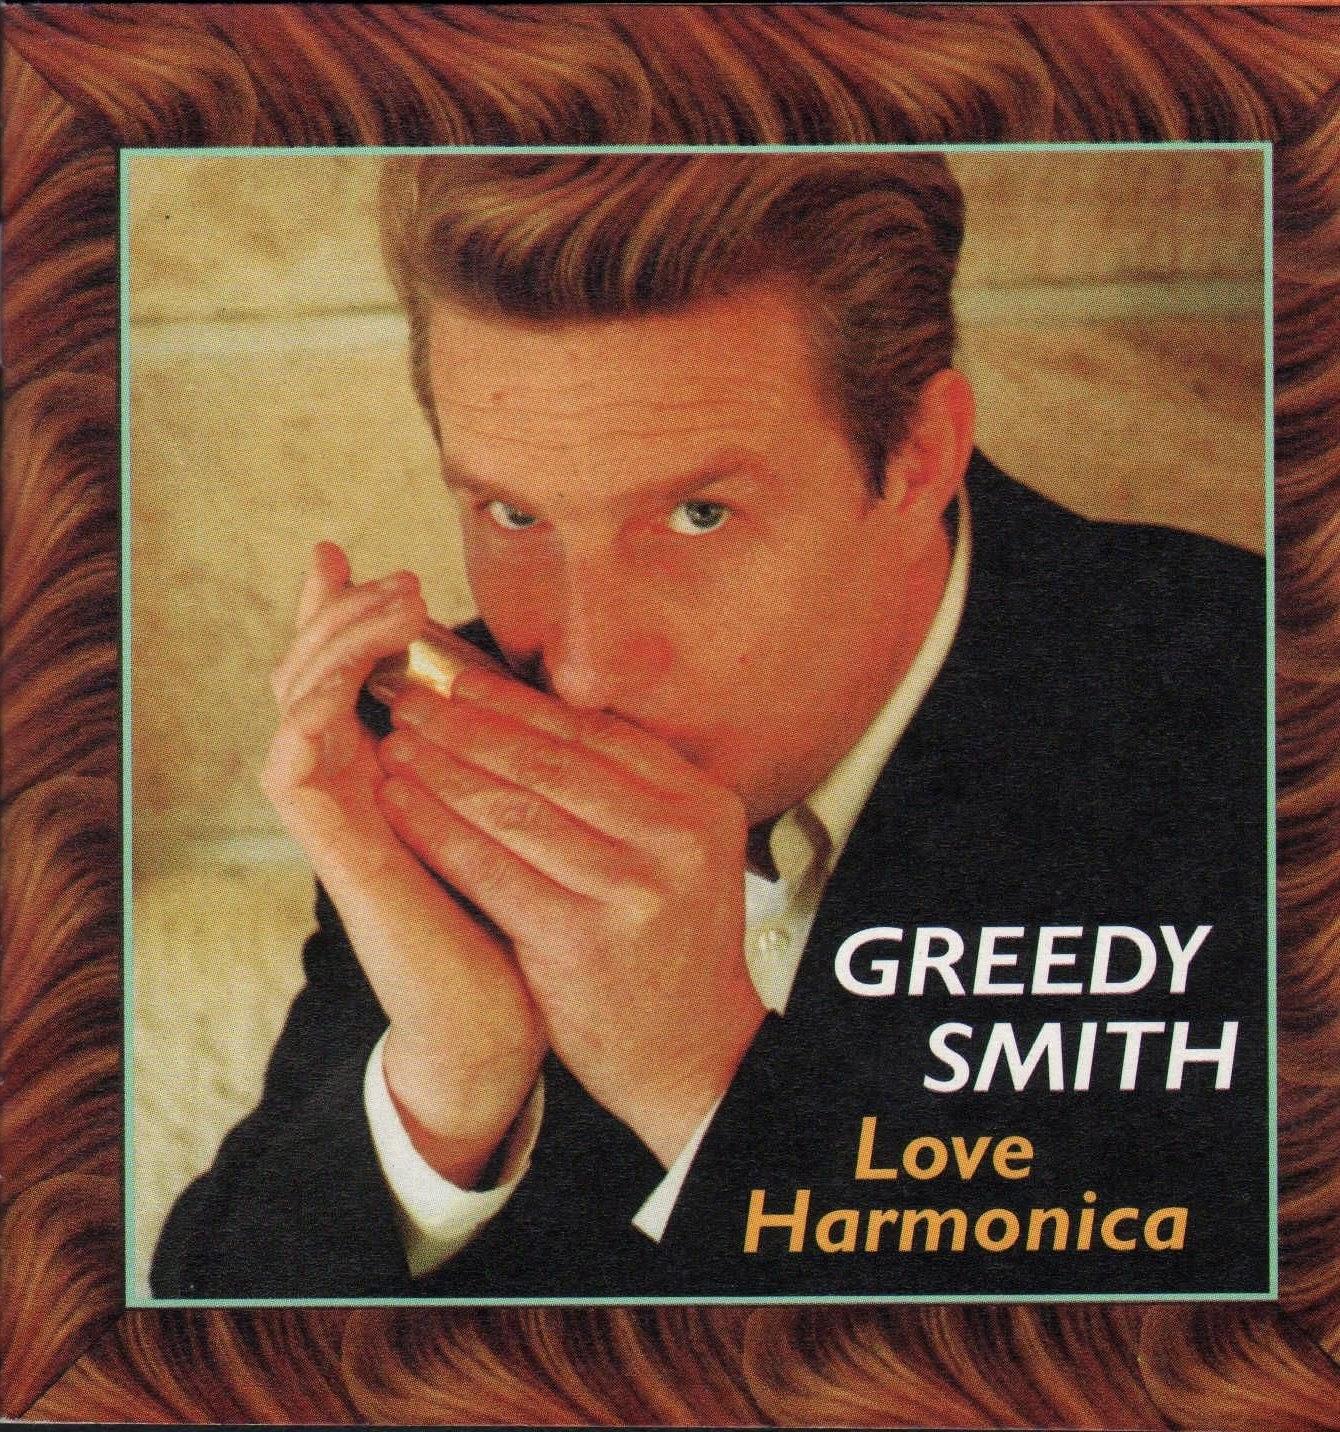 greedy smith - photo #15